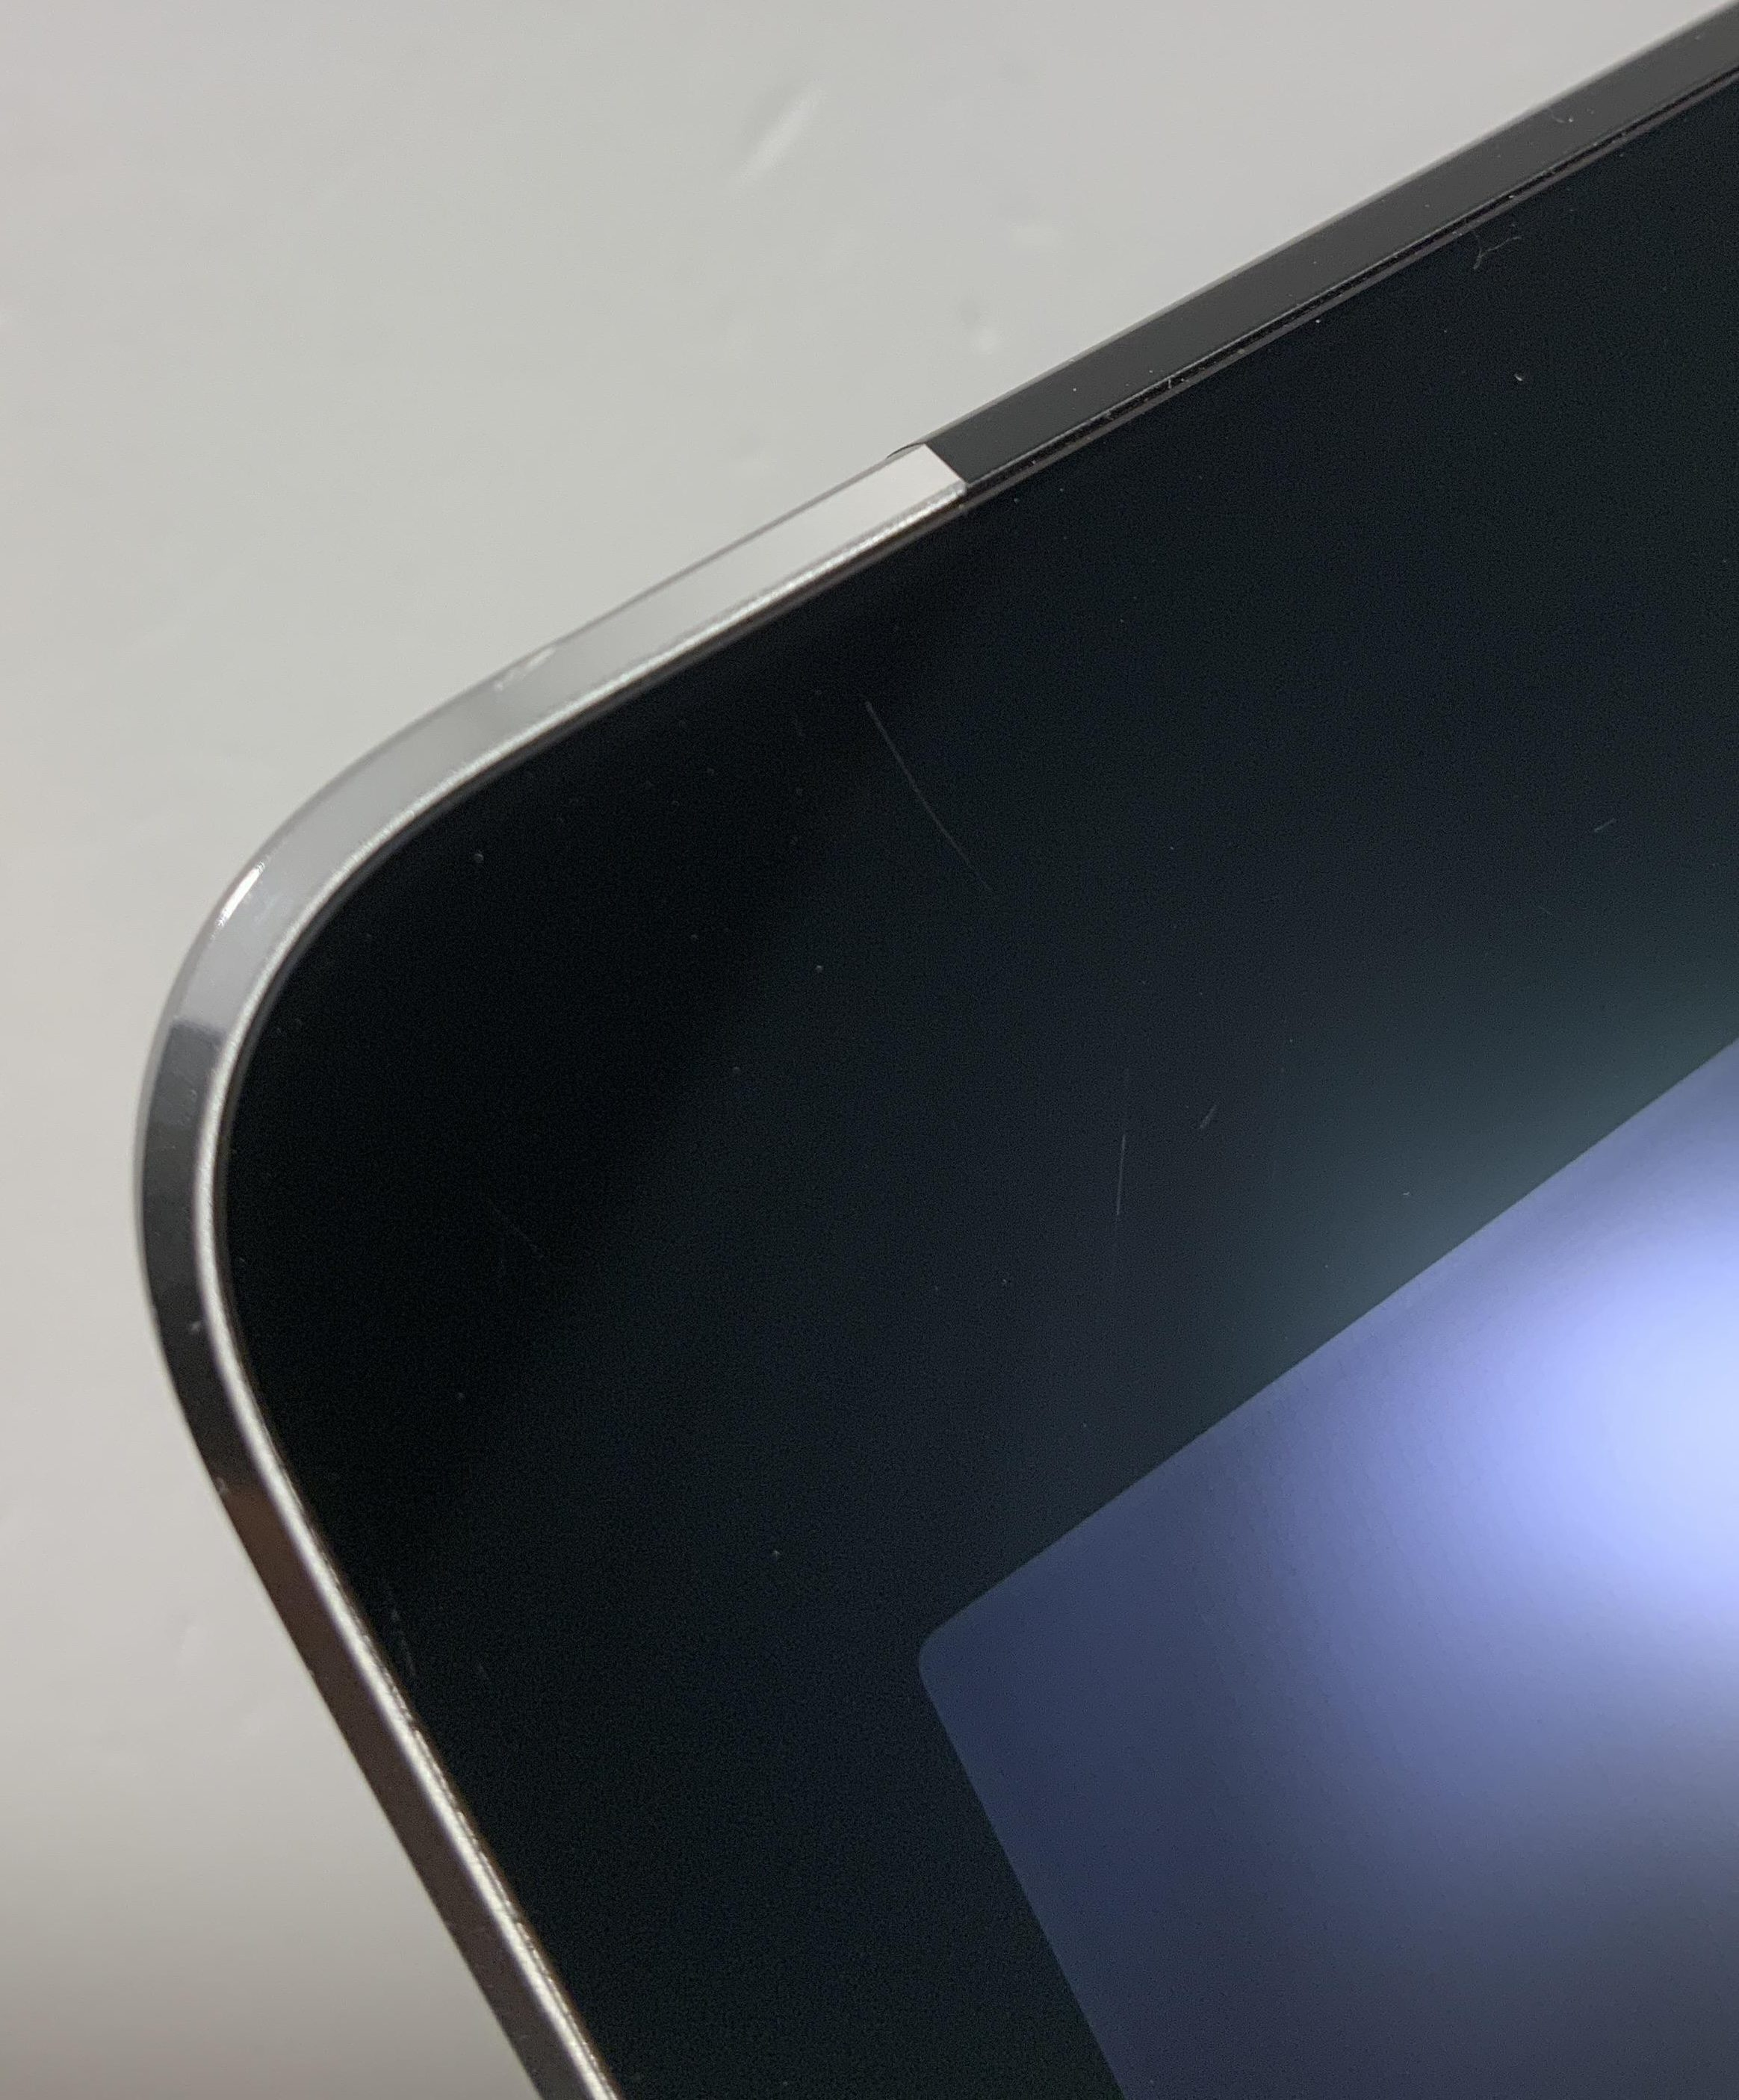 iPad Air 2 Wi-Fi + Cellular 64GB, 64GB, Space Gray, bild 3